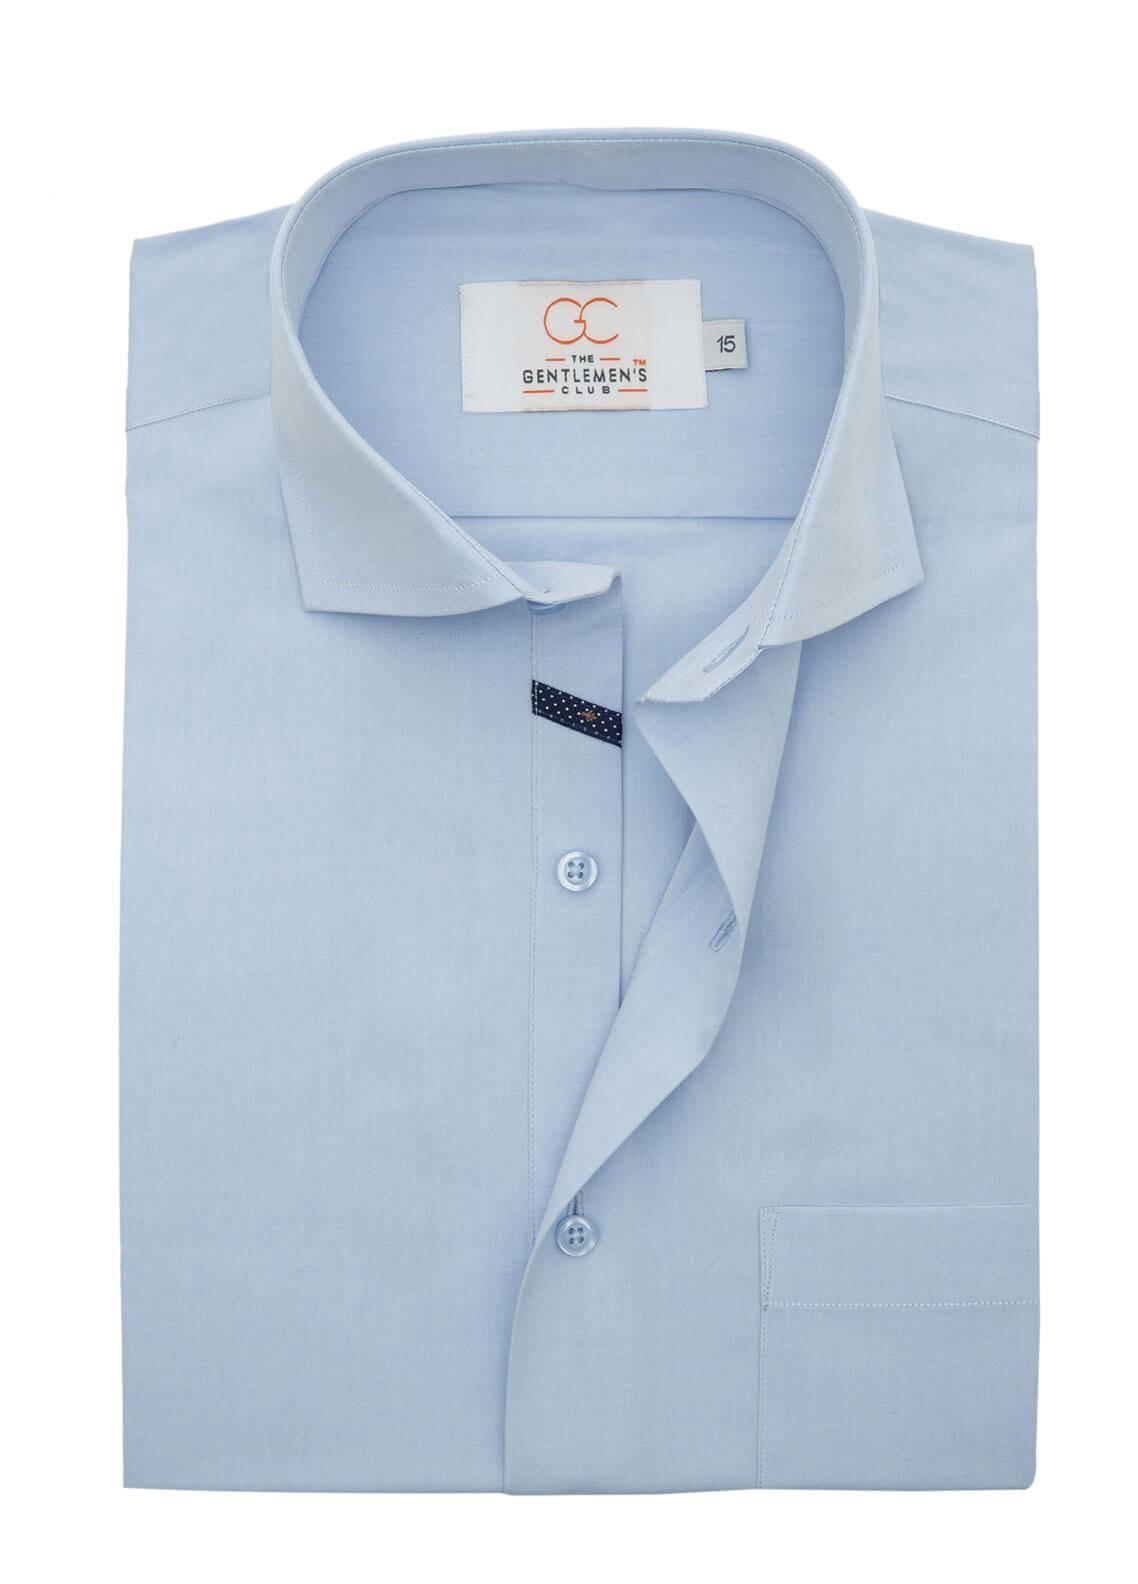 The Gentlemen's Club Cotton Formal Shirts for Men - Sky Blue White Label 4085 - 17.5